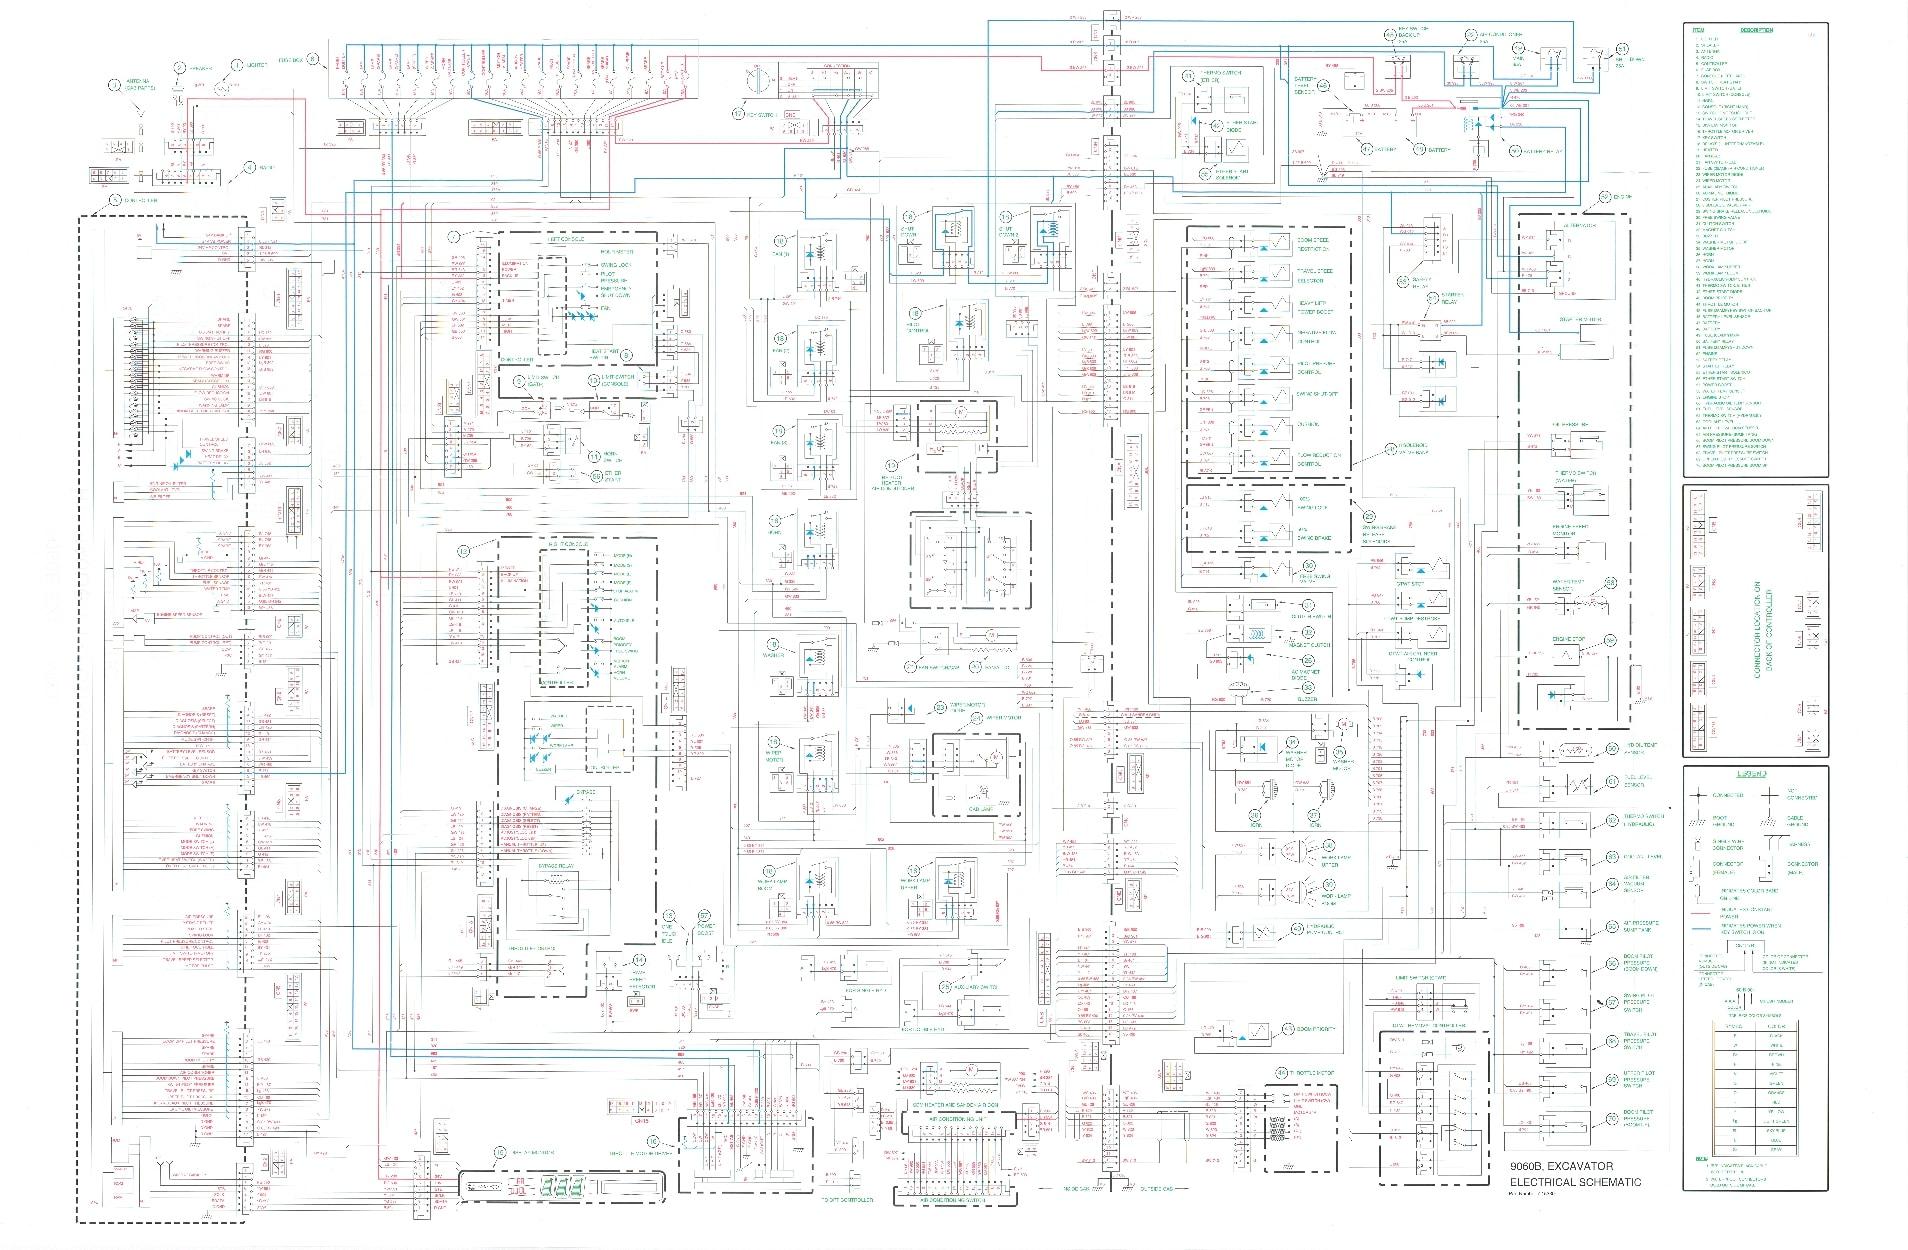 Case B Excavator Hydraulic Electrical Schematic